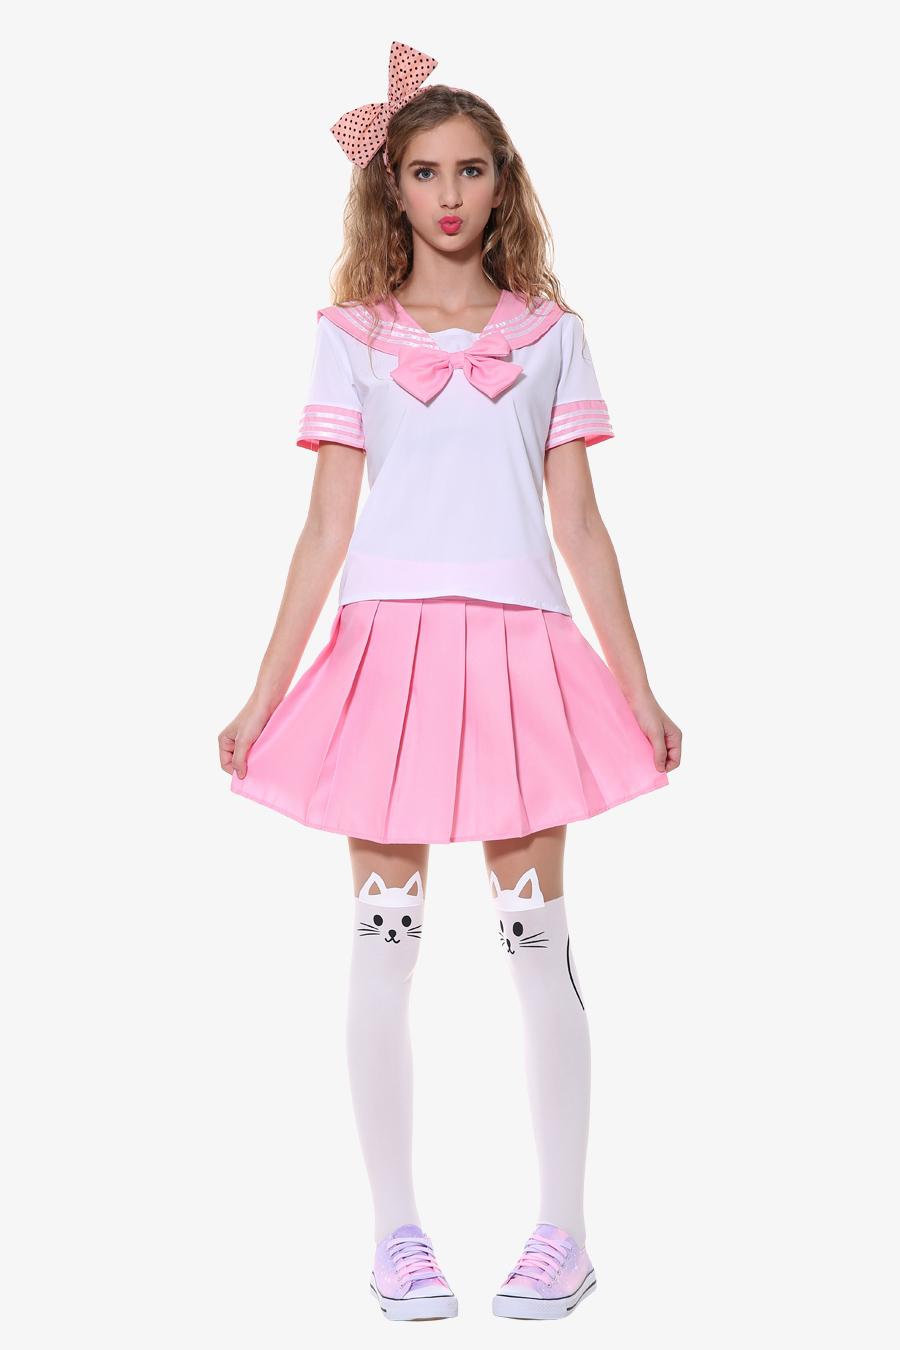 J-Fashion Sailor Seifuku School Uniformone Pair Of Tight -9800